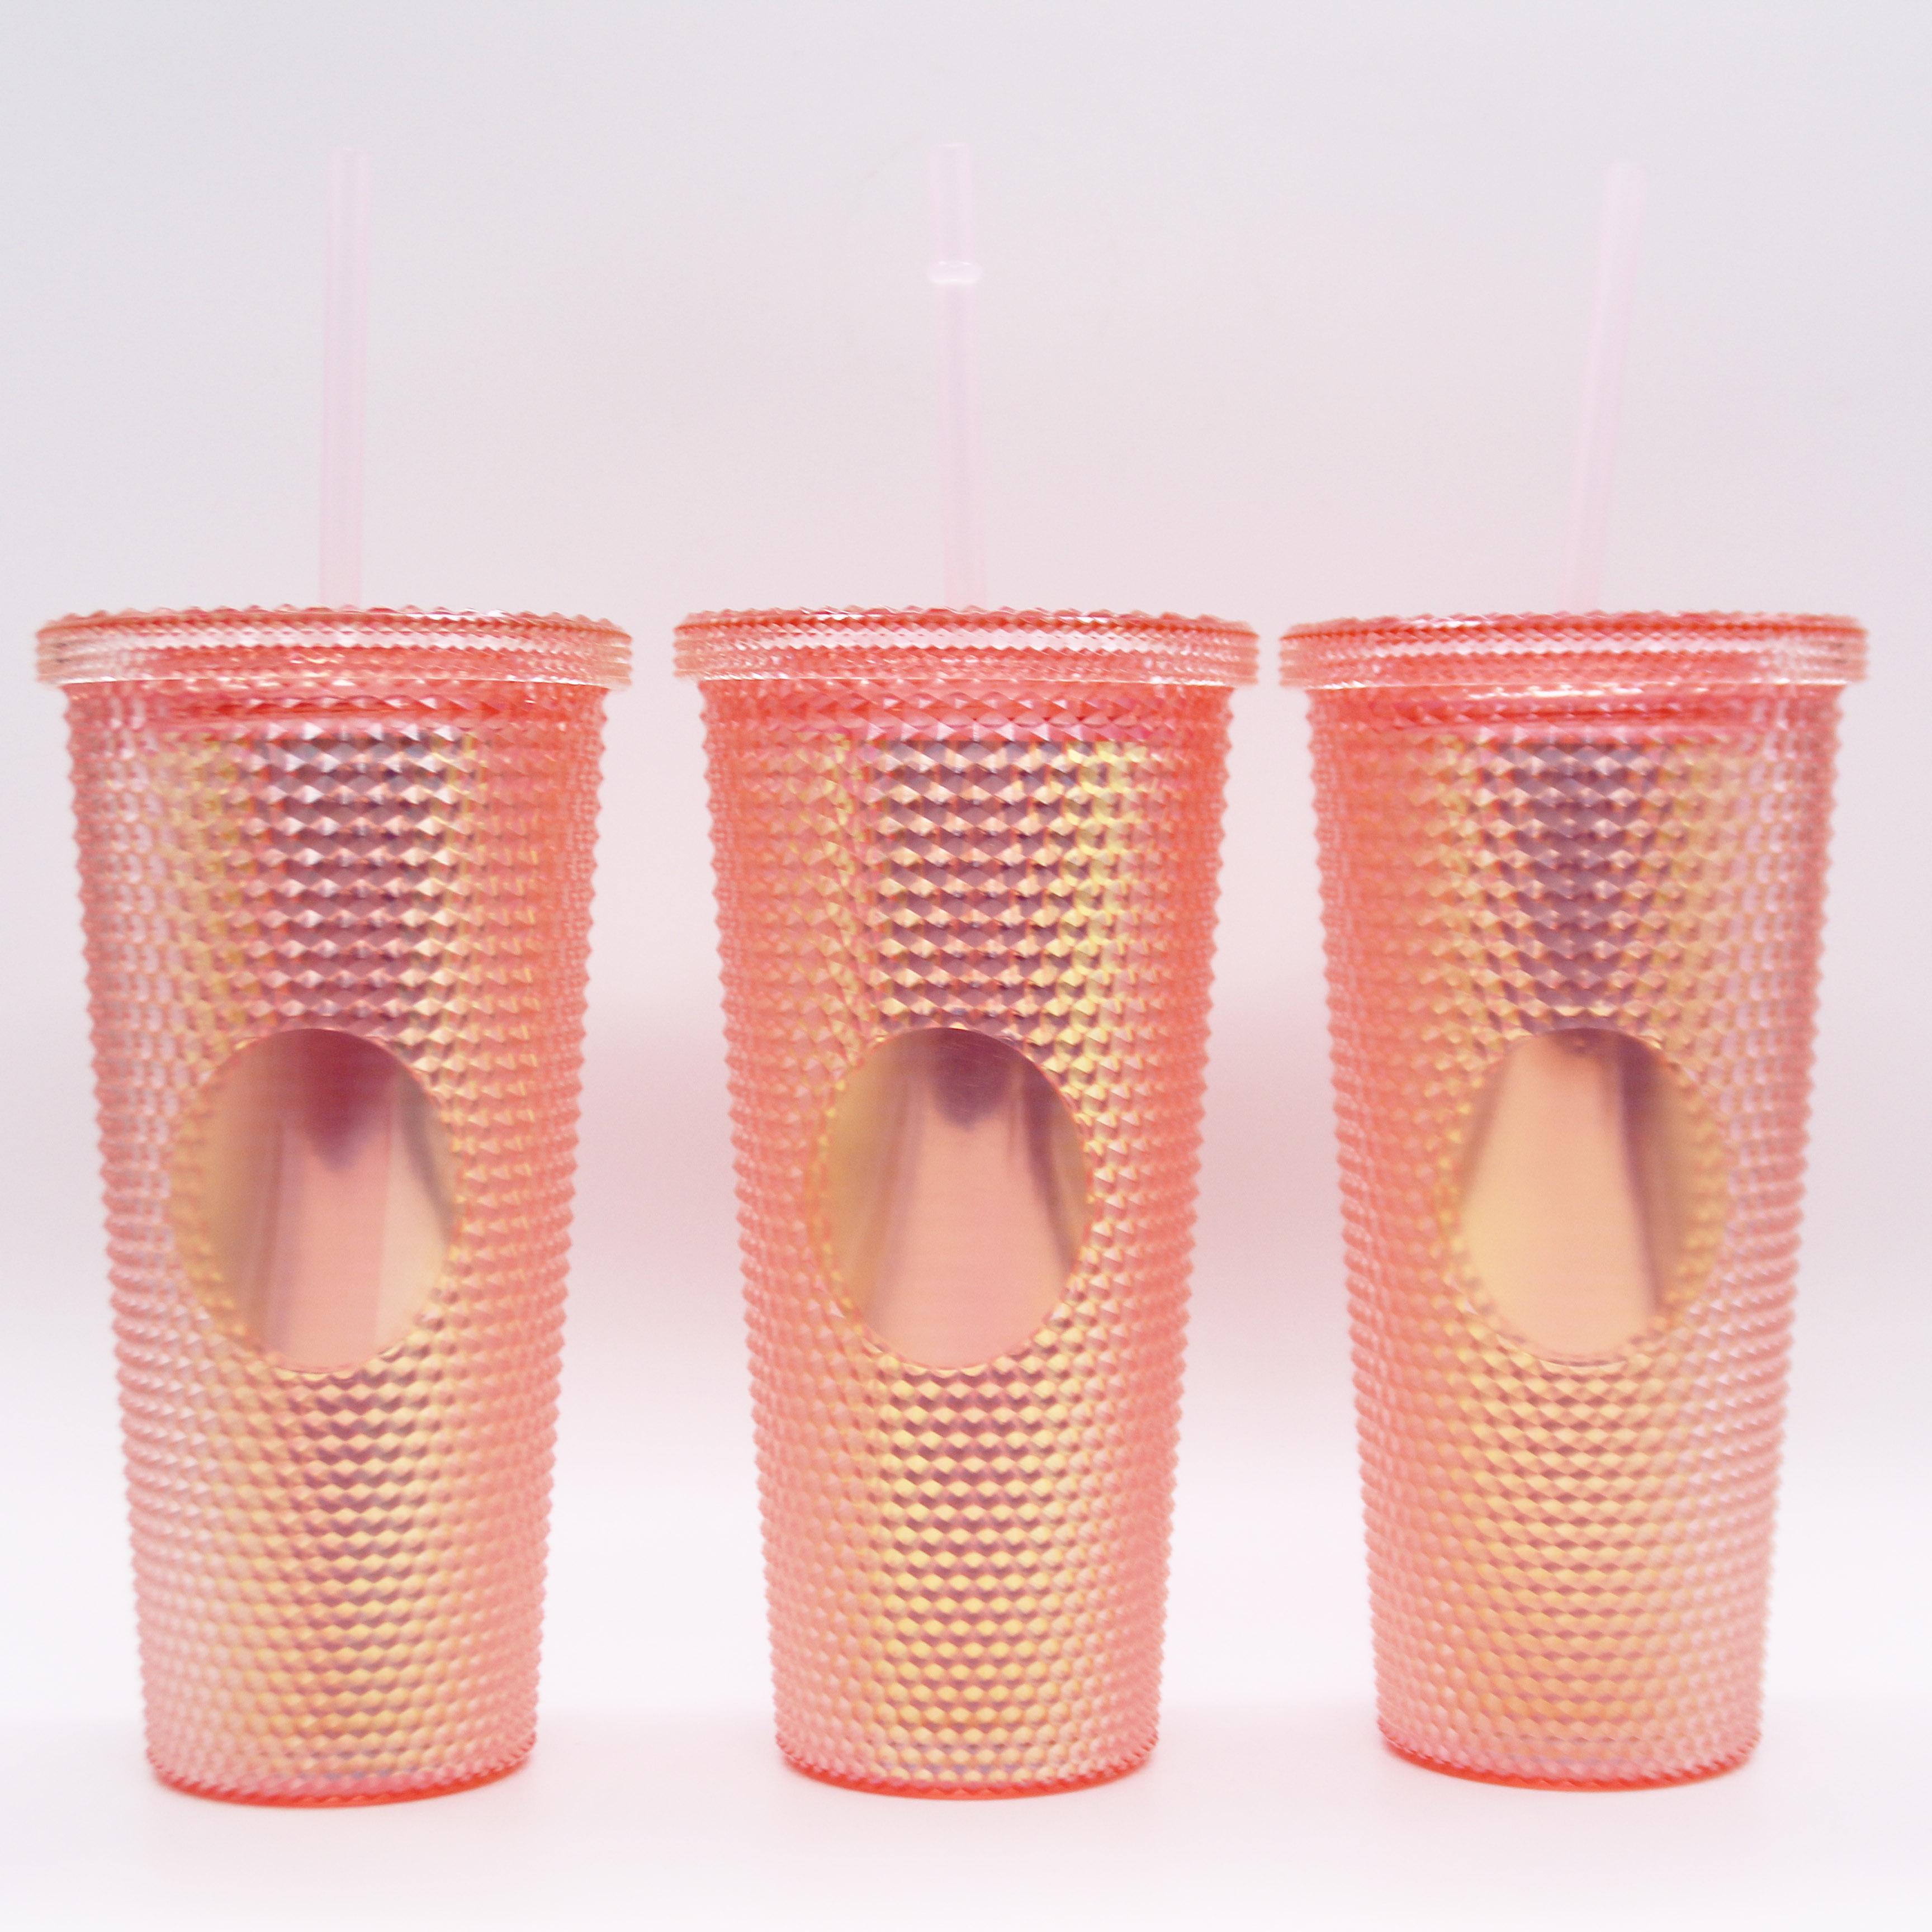 24oz New Design Double Wall Plastic Diamond Acrylic Straw Tumbler with lid